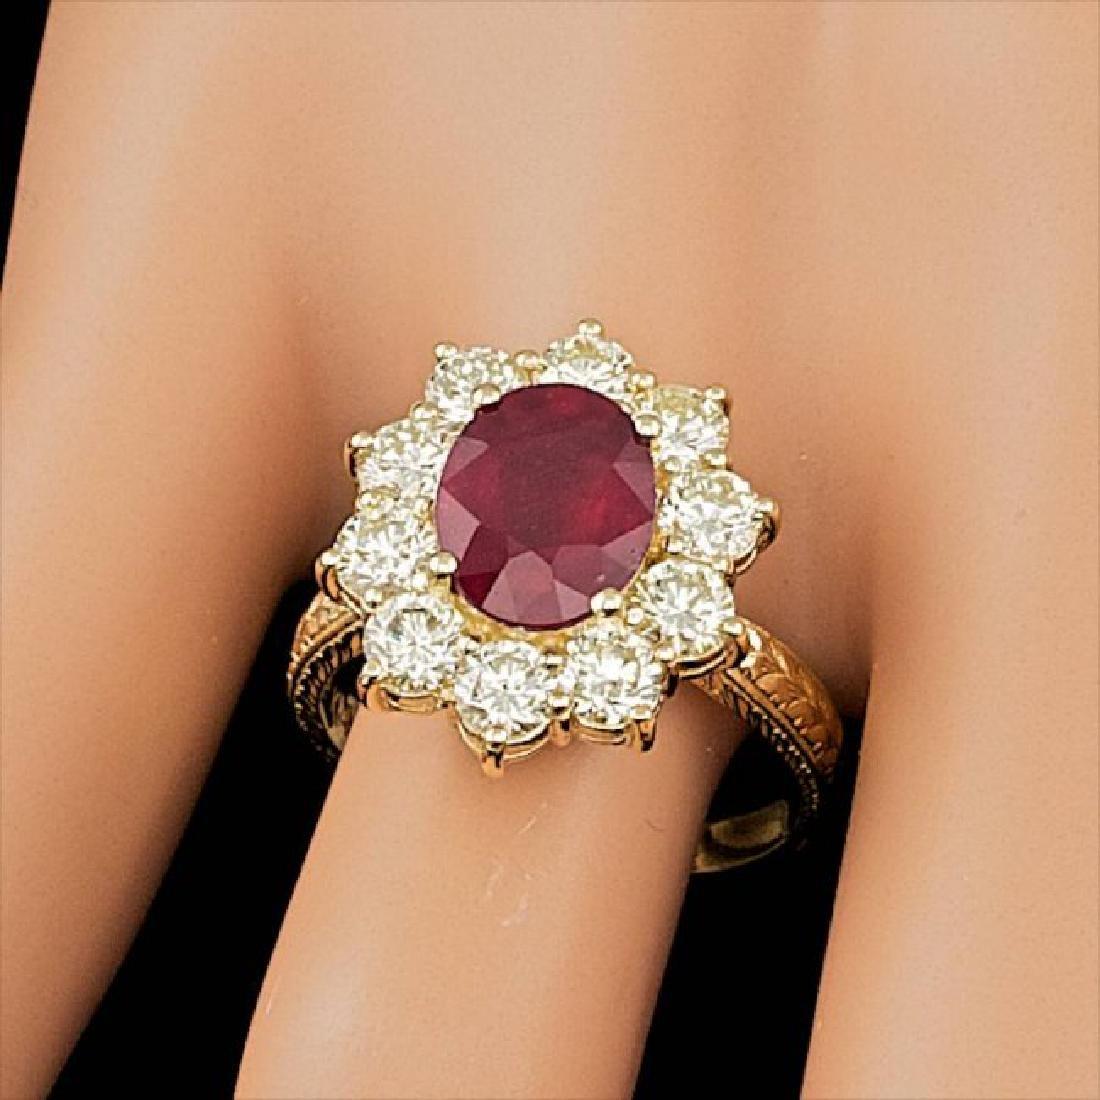 14k Yellow Gold 3.00ct Ruby 2.10ct Diamond Ring - 3